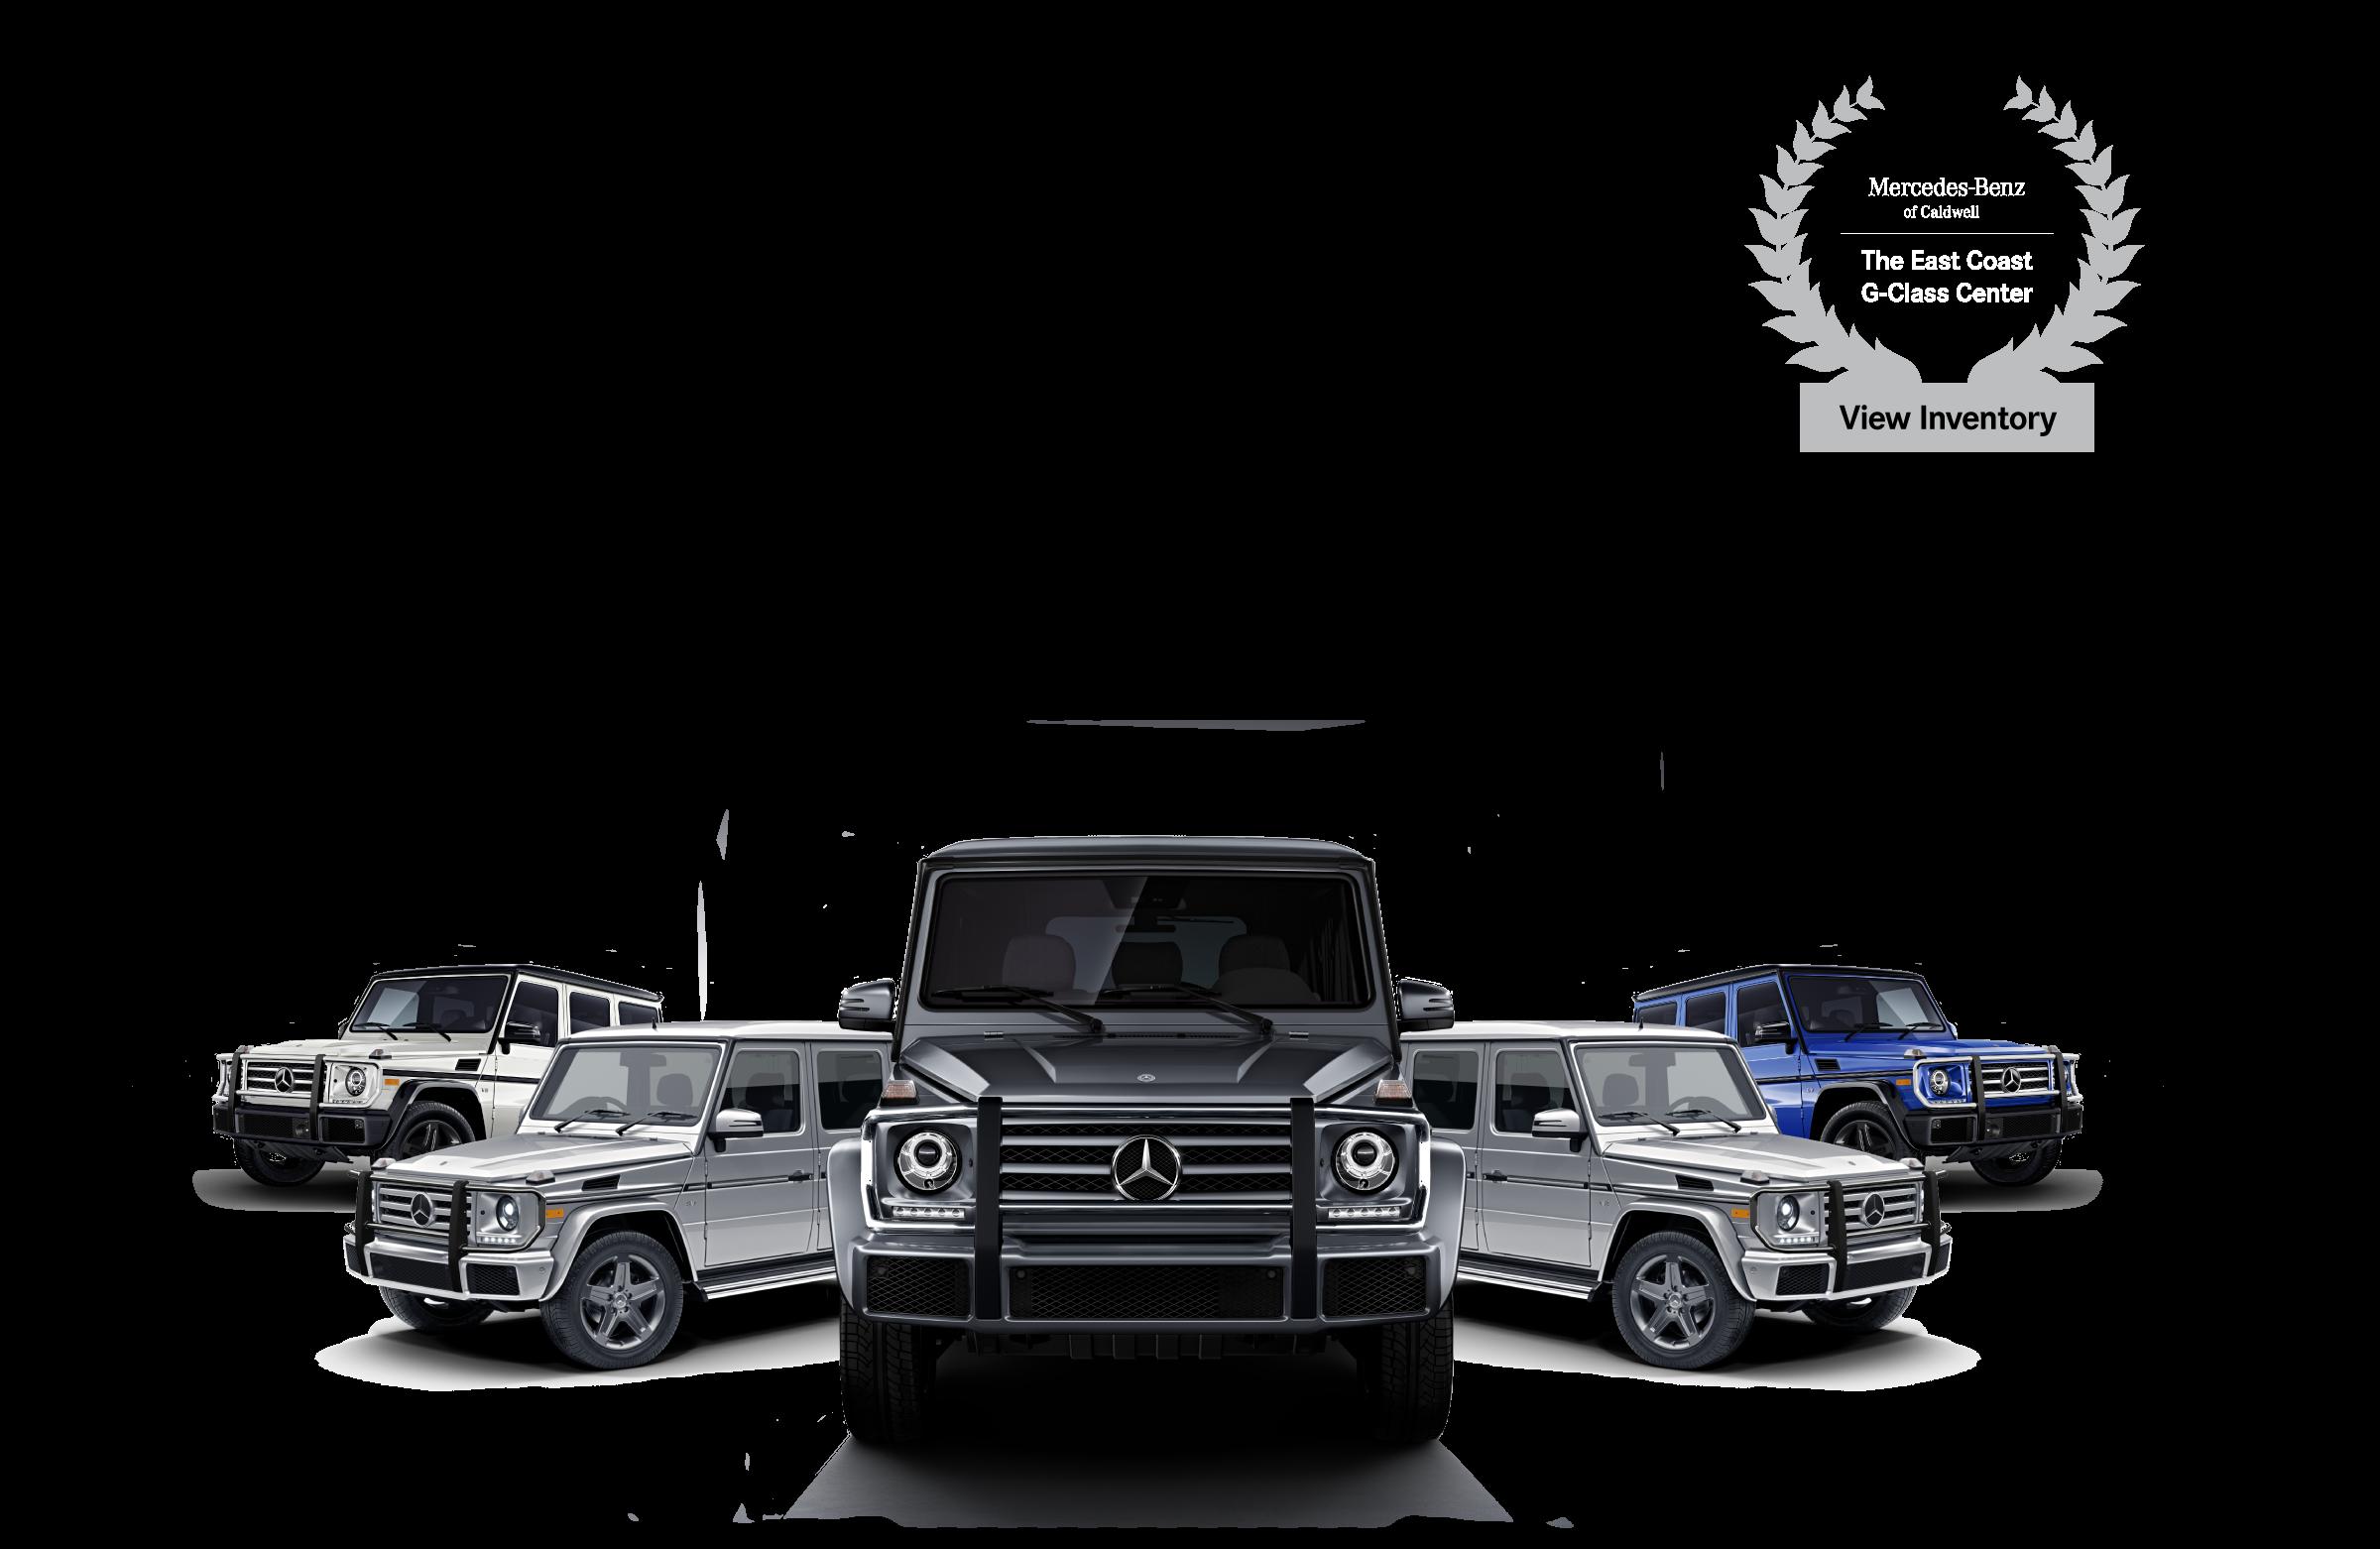 2019 G-Class Mercedes-Benz   G-Wagon SUV   Mercedes-Benz of Caldwell